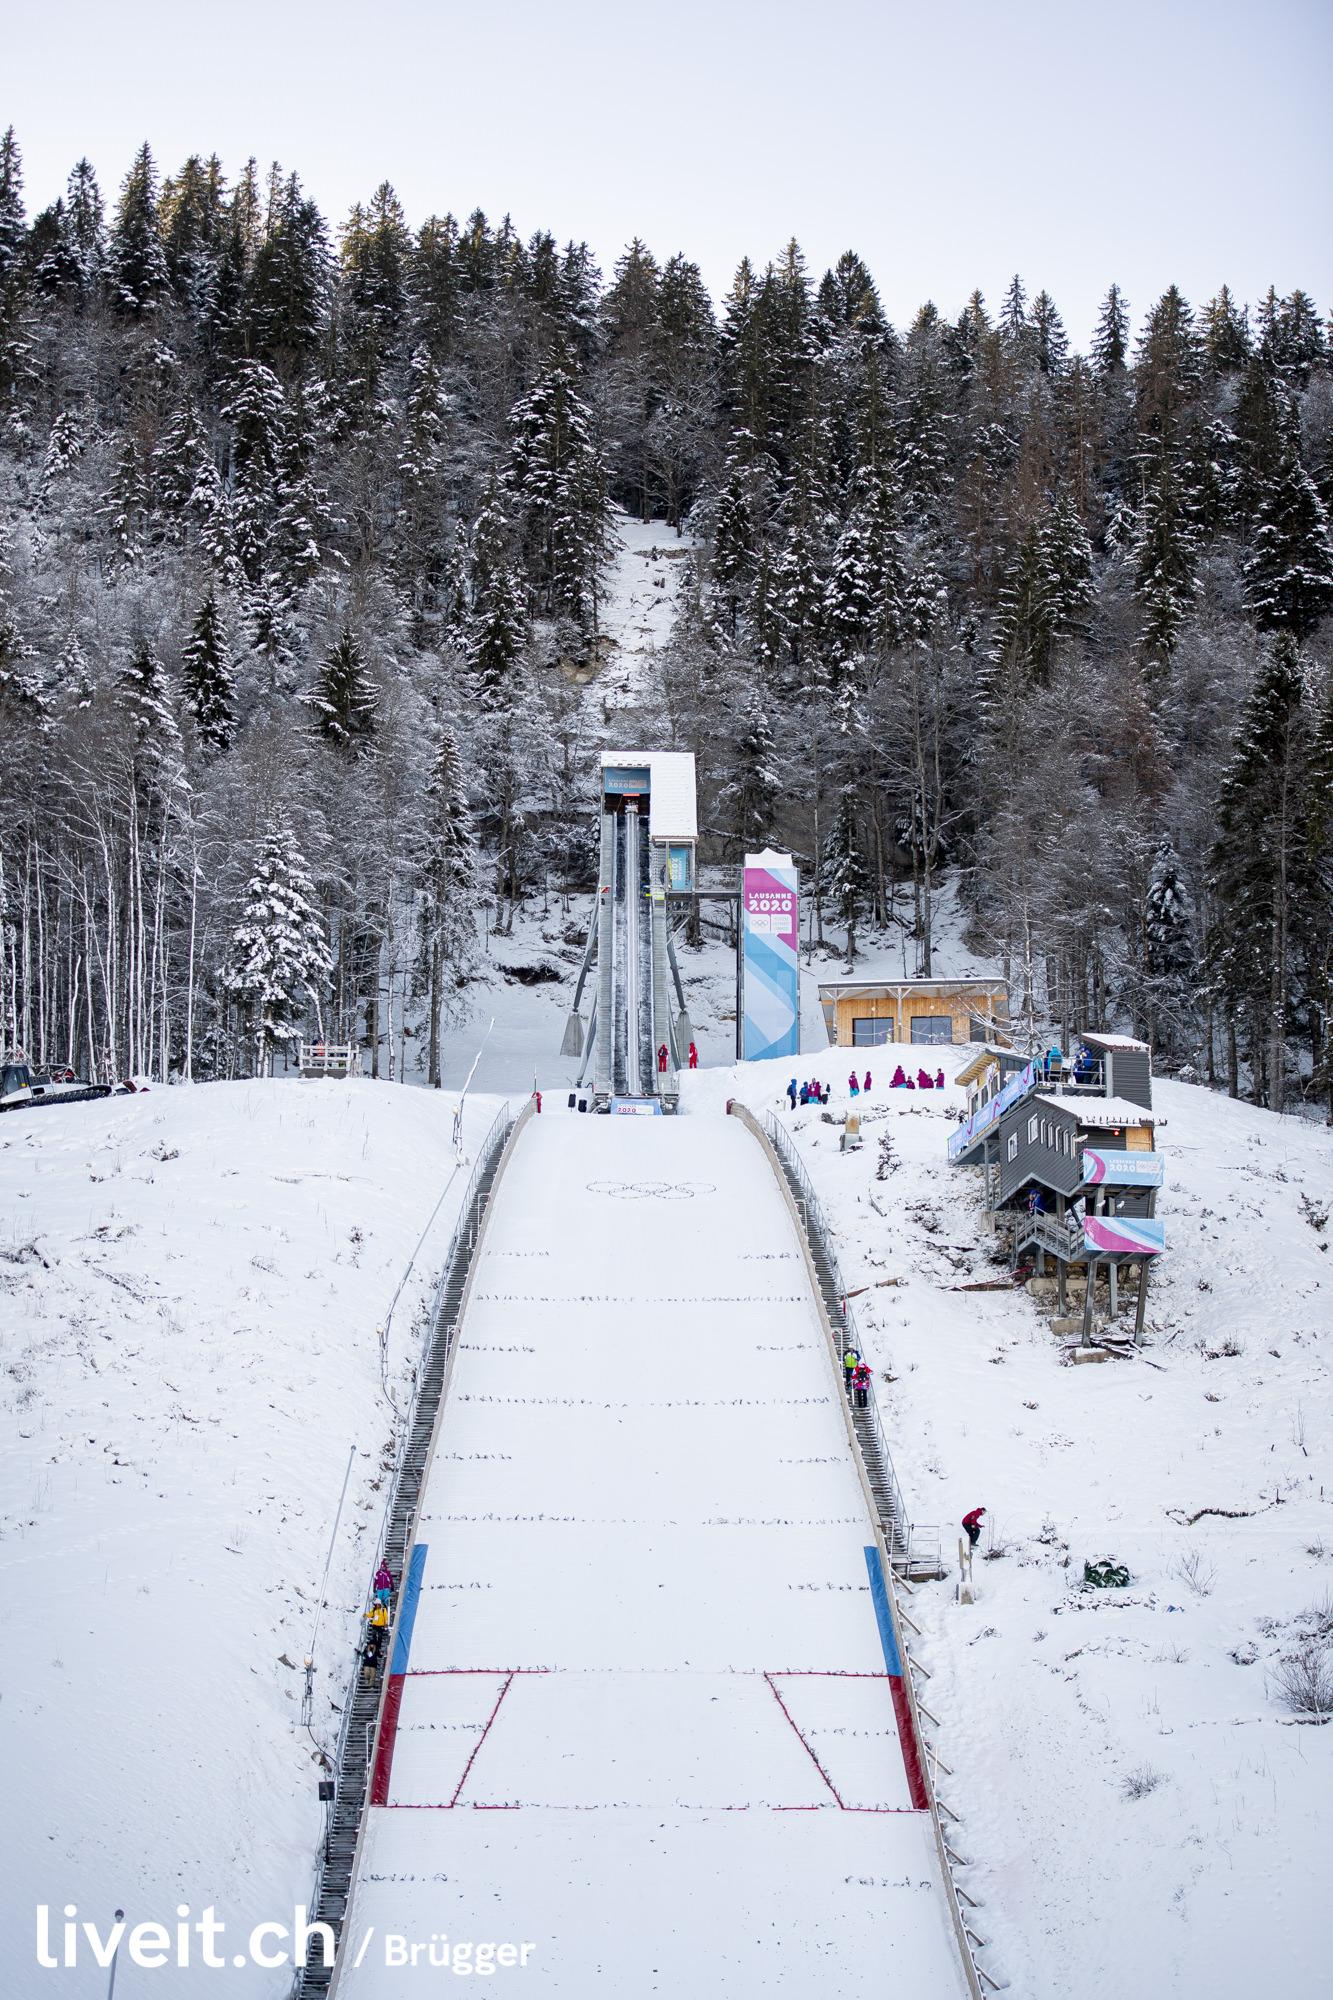 SWITZERLAND LES TUFFES YOG LAUSANNE2020 SKI JUMPING